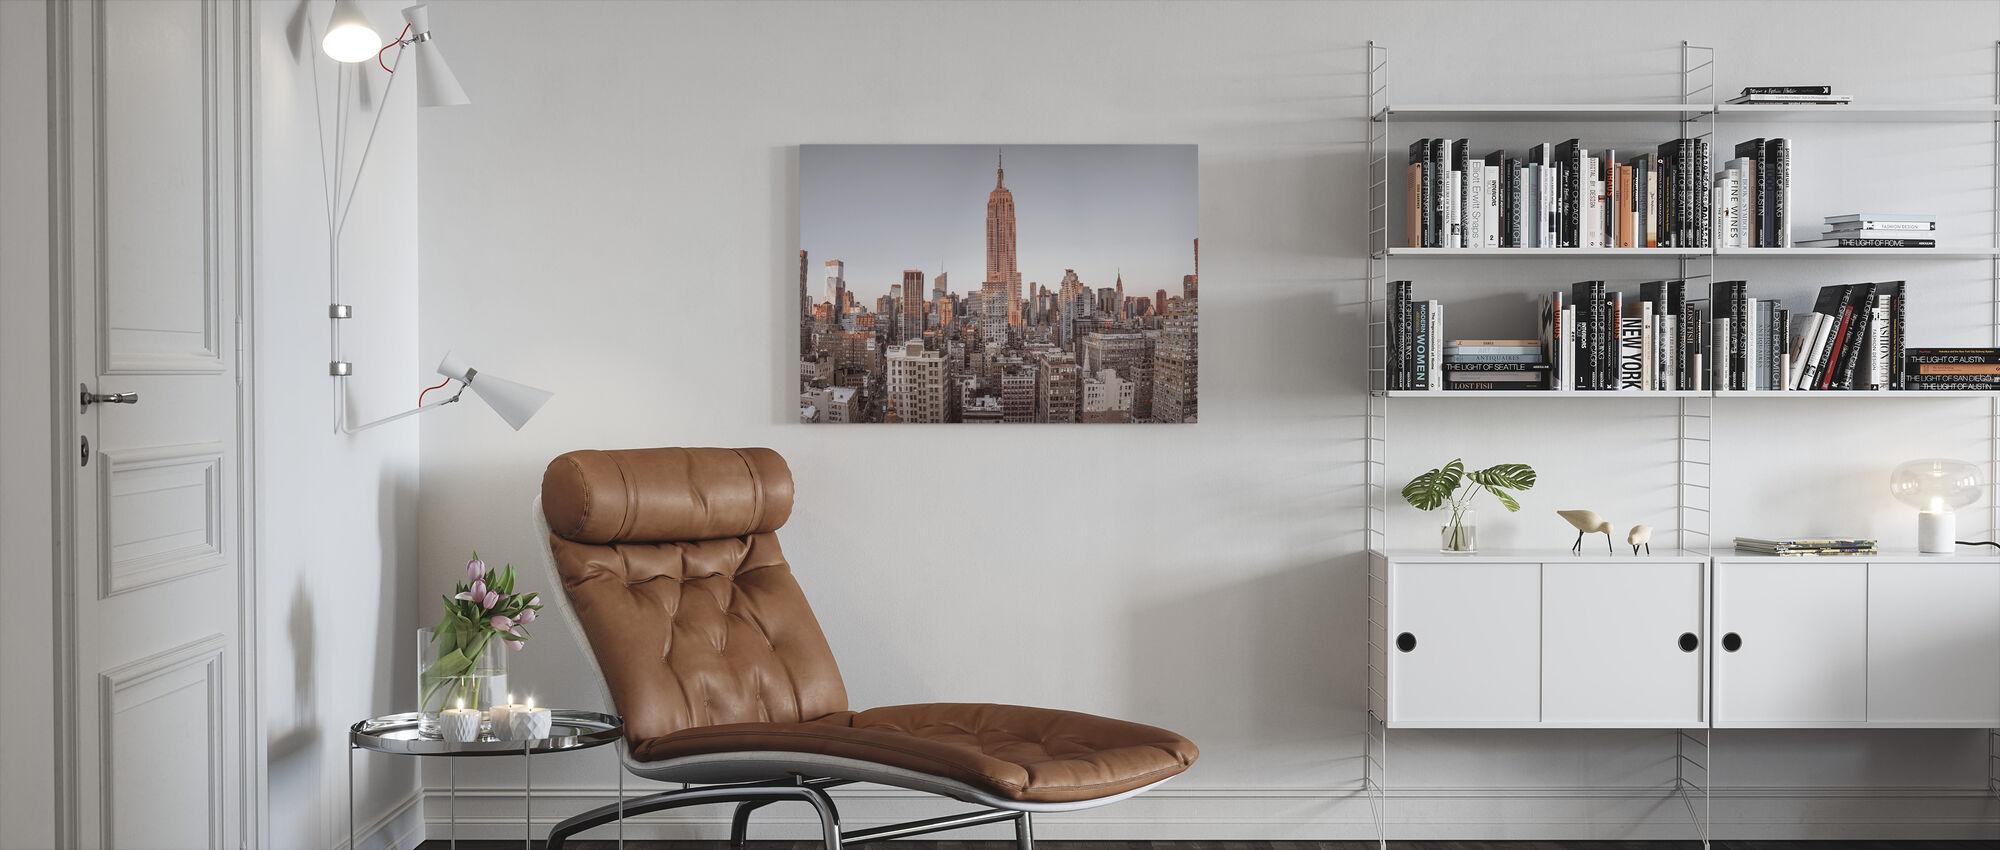 New Yorkin lintunäkymä - Canvastaulu - Olohuone